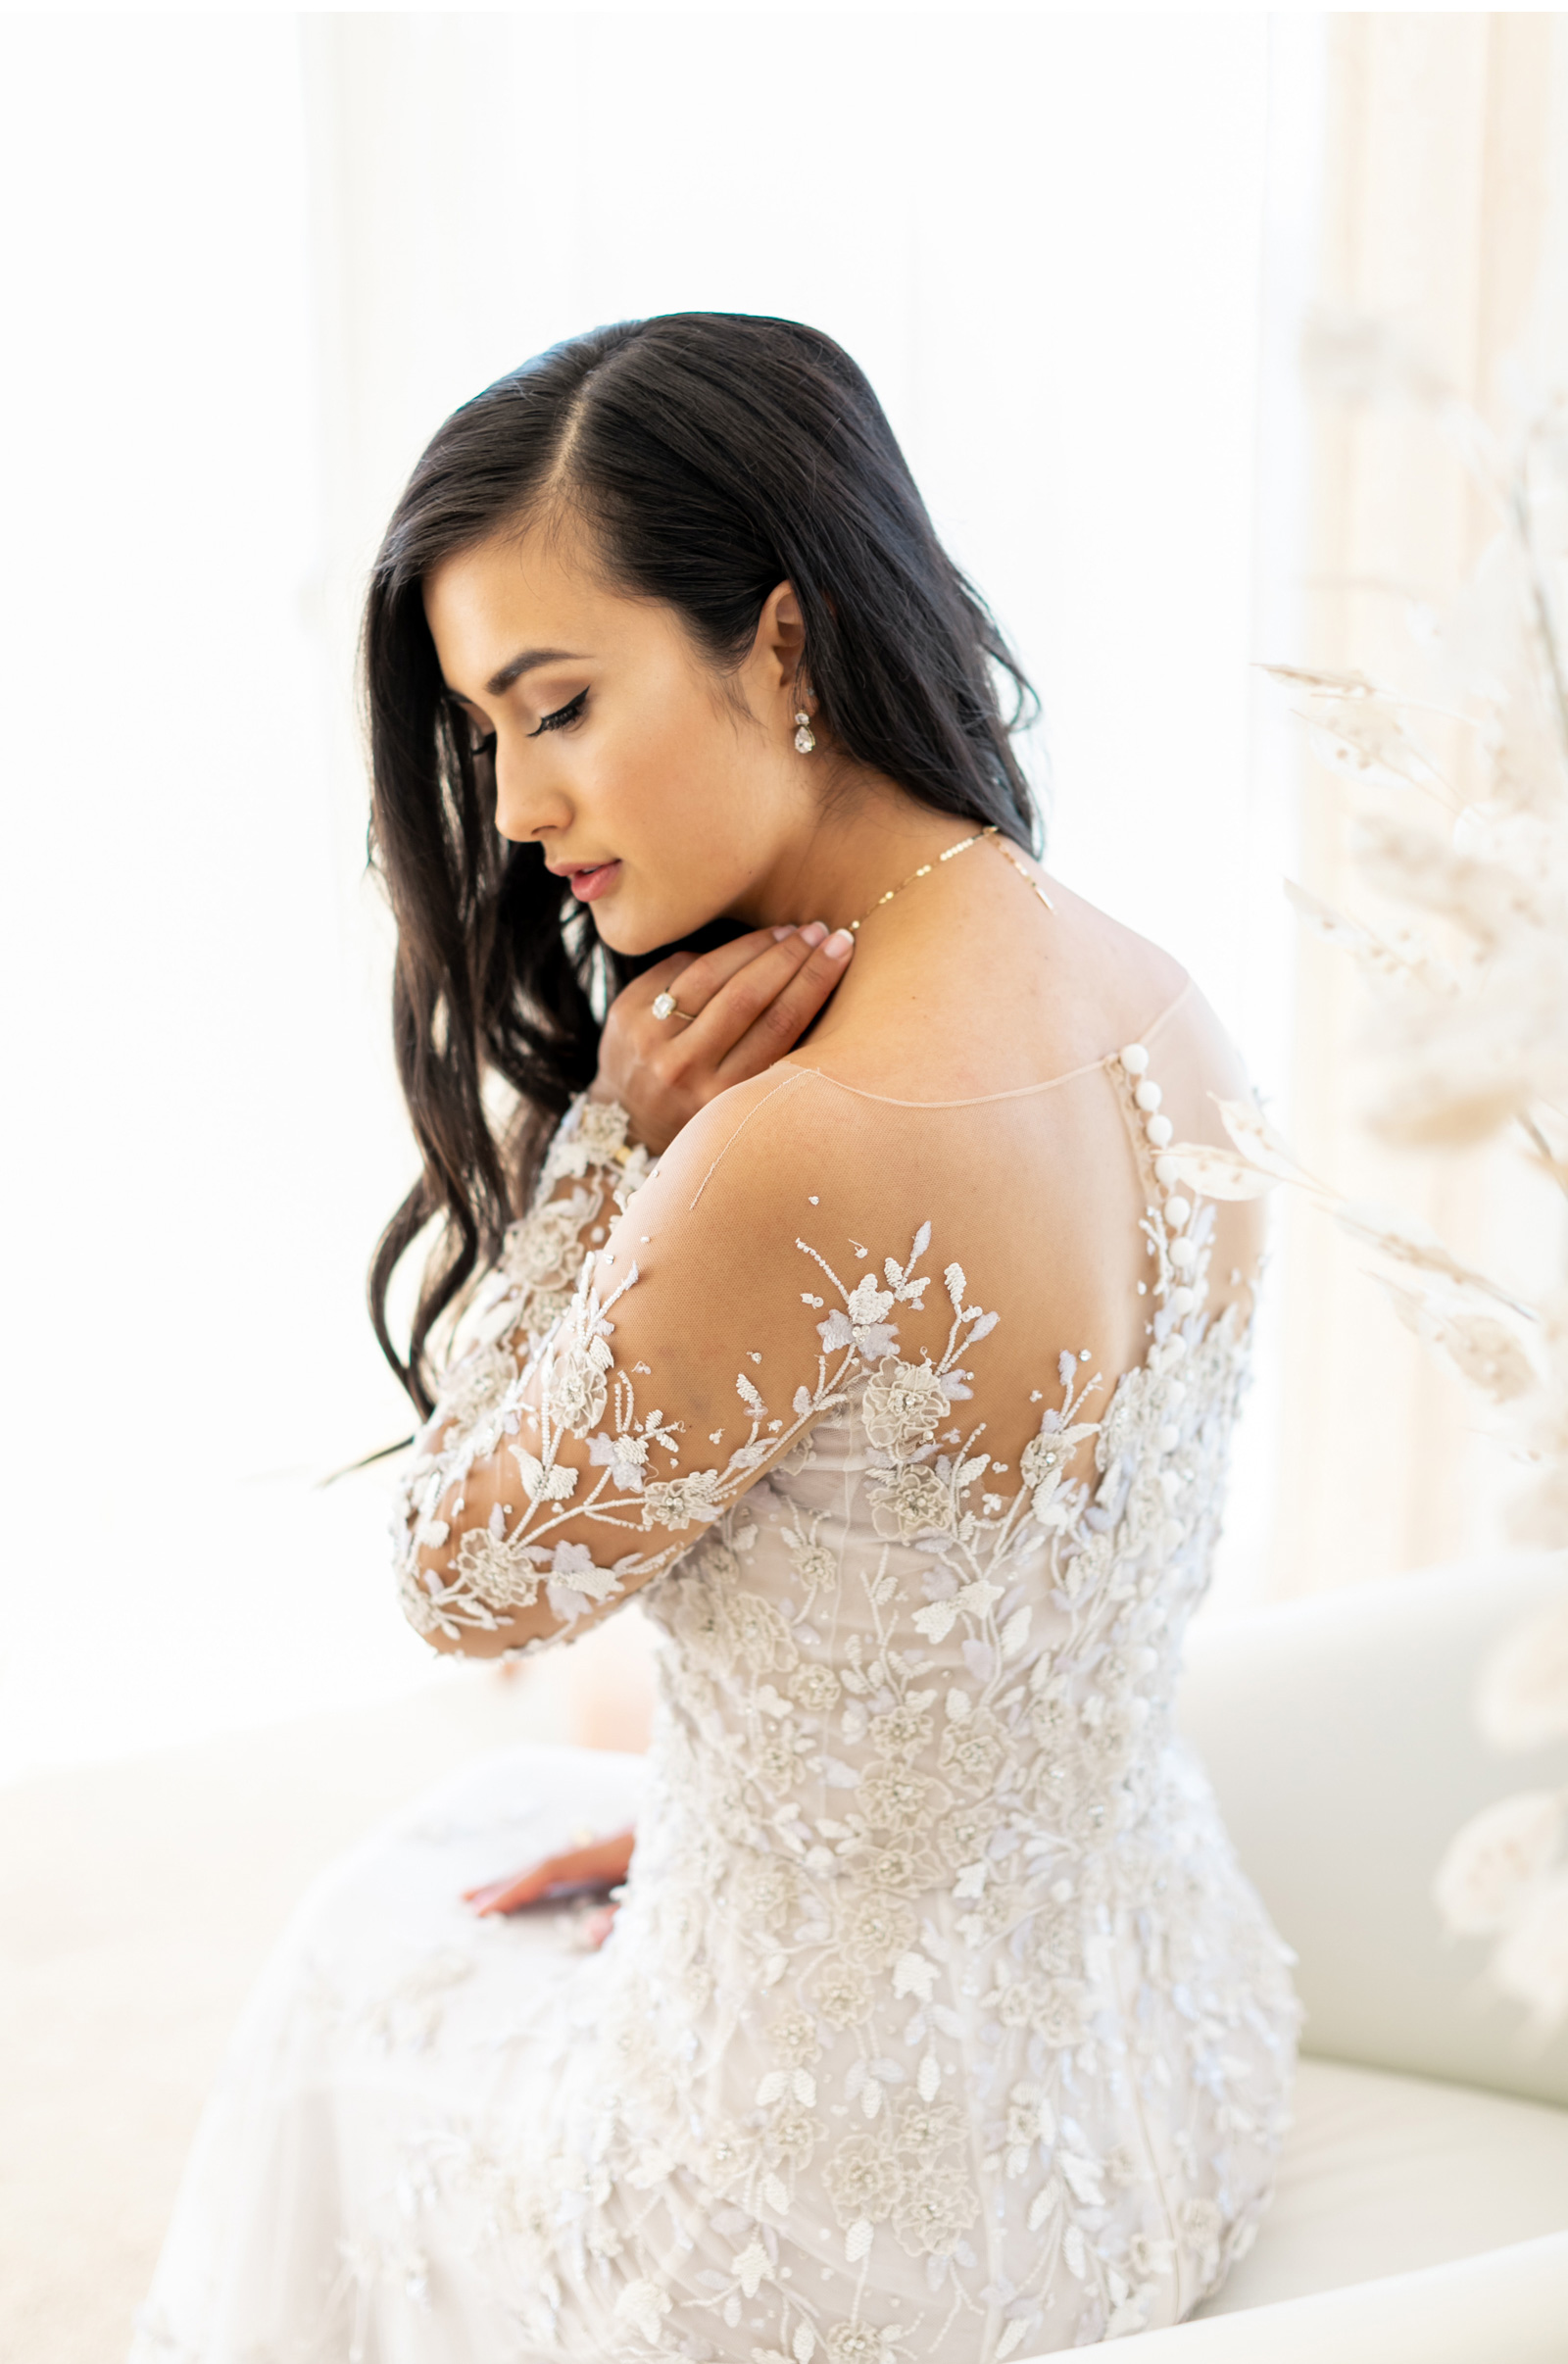 Southern-California-Wedding-Photographer-Natalie-Schutt-Photography-Style-Me-Pretty-Malibu-Rocky-Oaks-Photographer_04.jpg